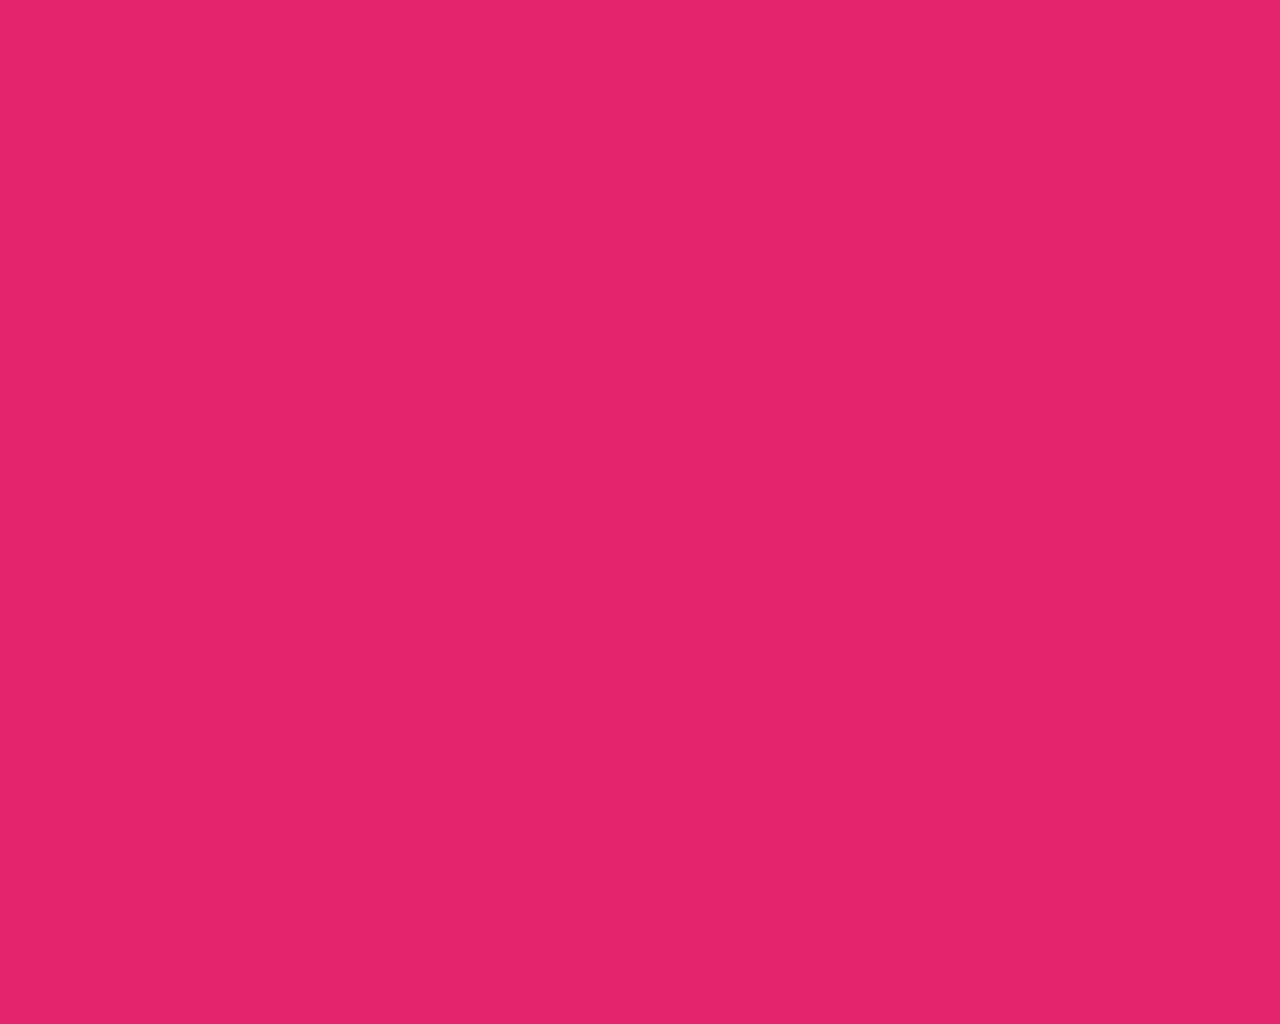 1280x1024 Razzmatazz Solid Color Background